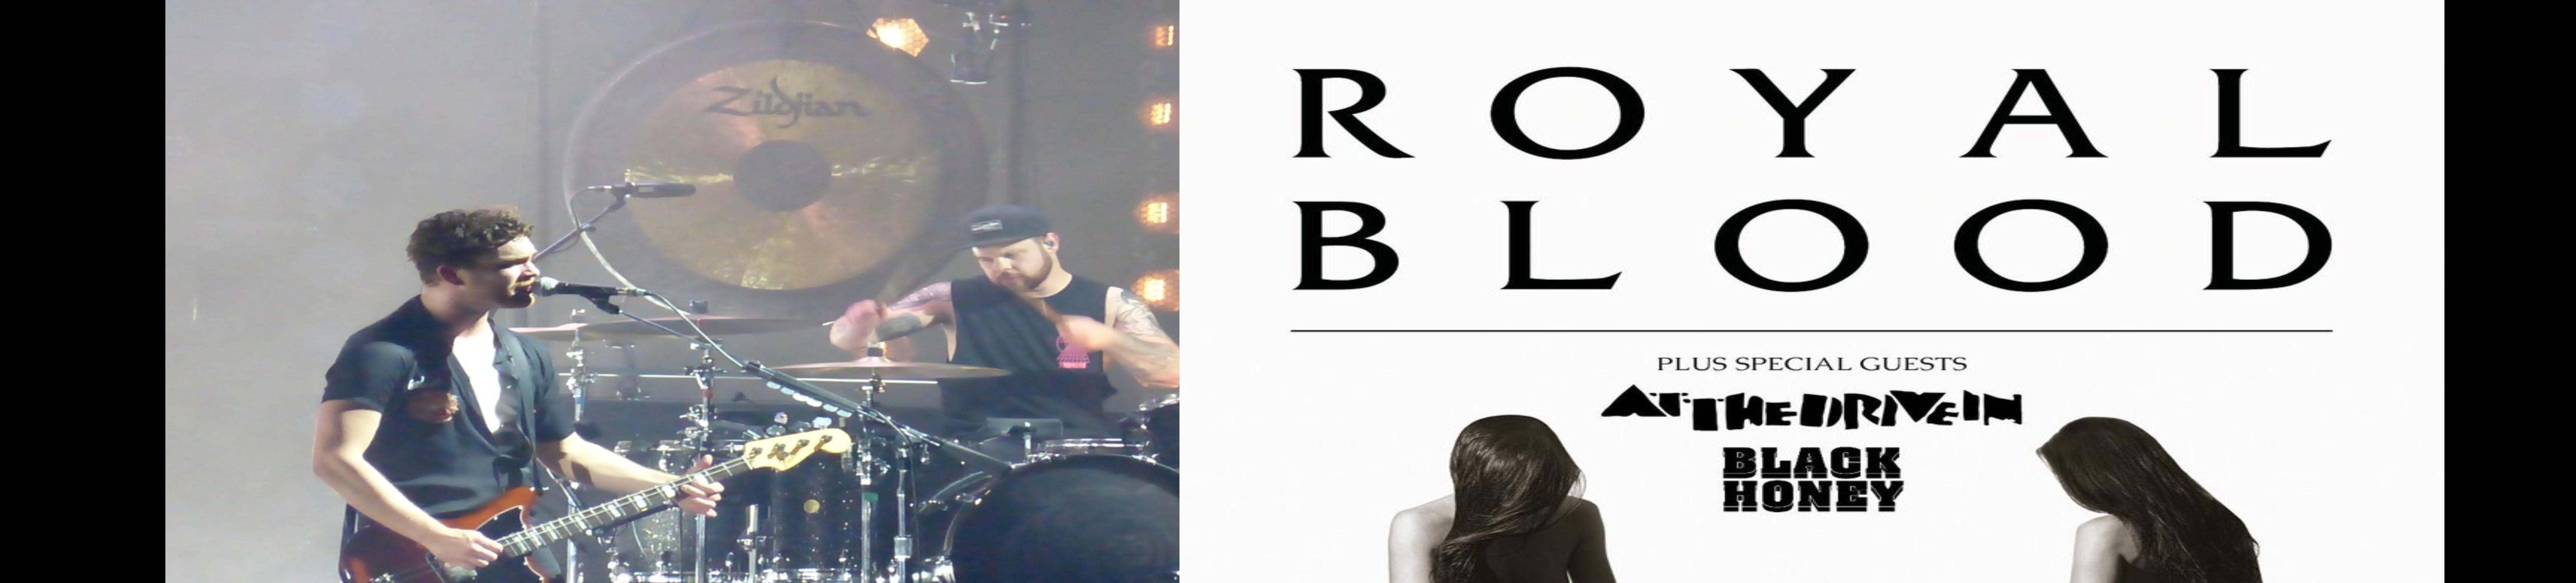 Royal-Blood-2017-1-1